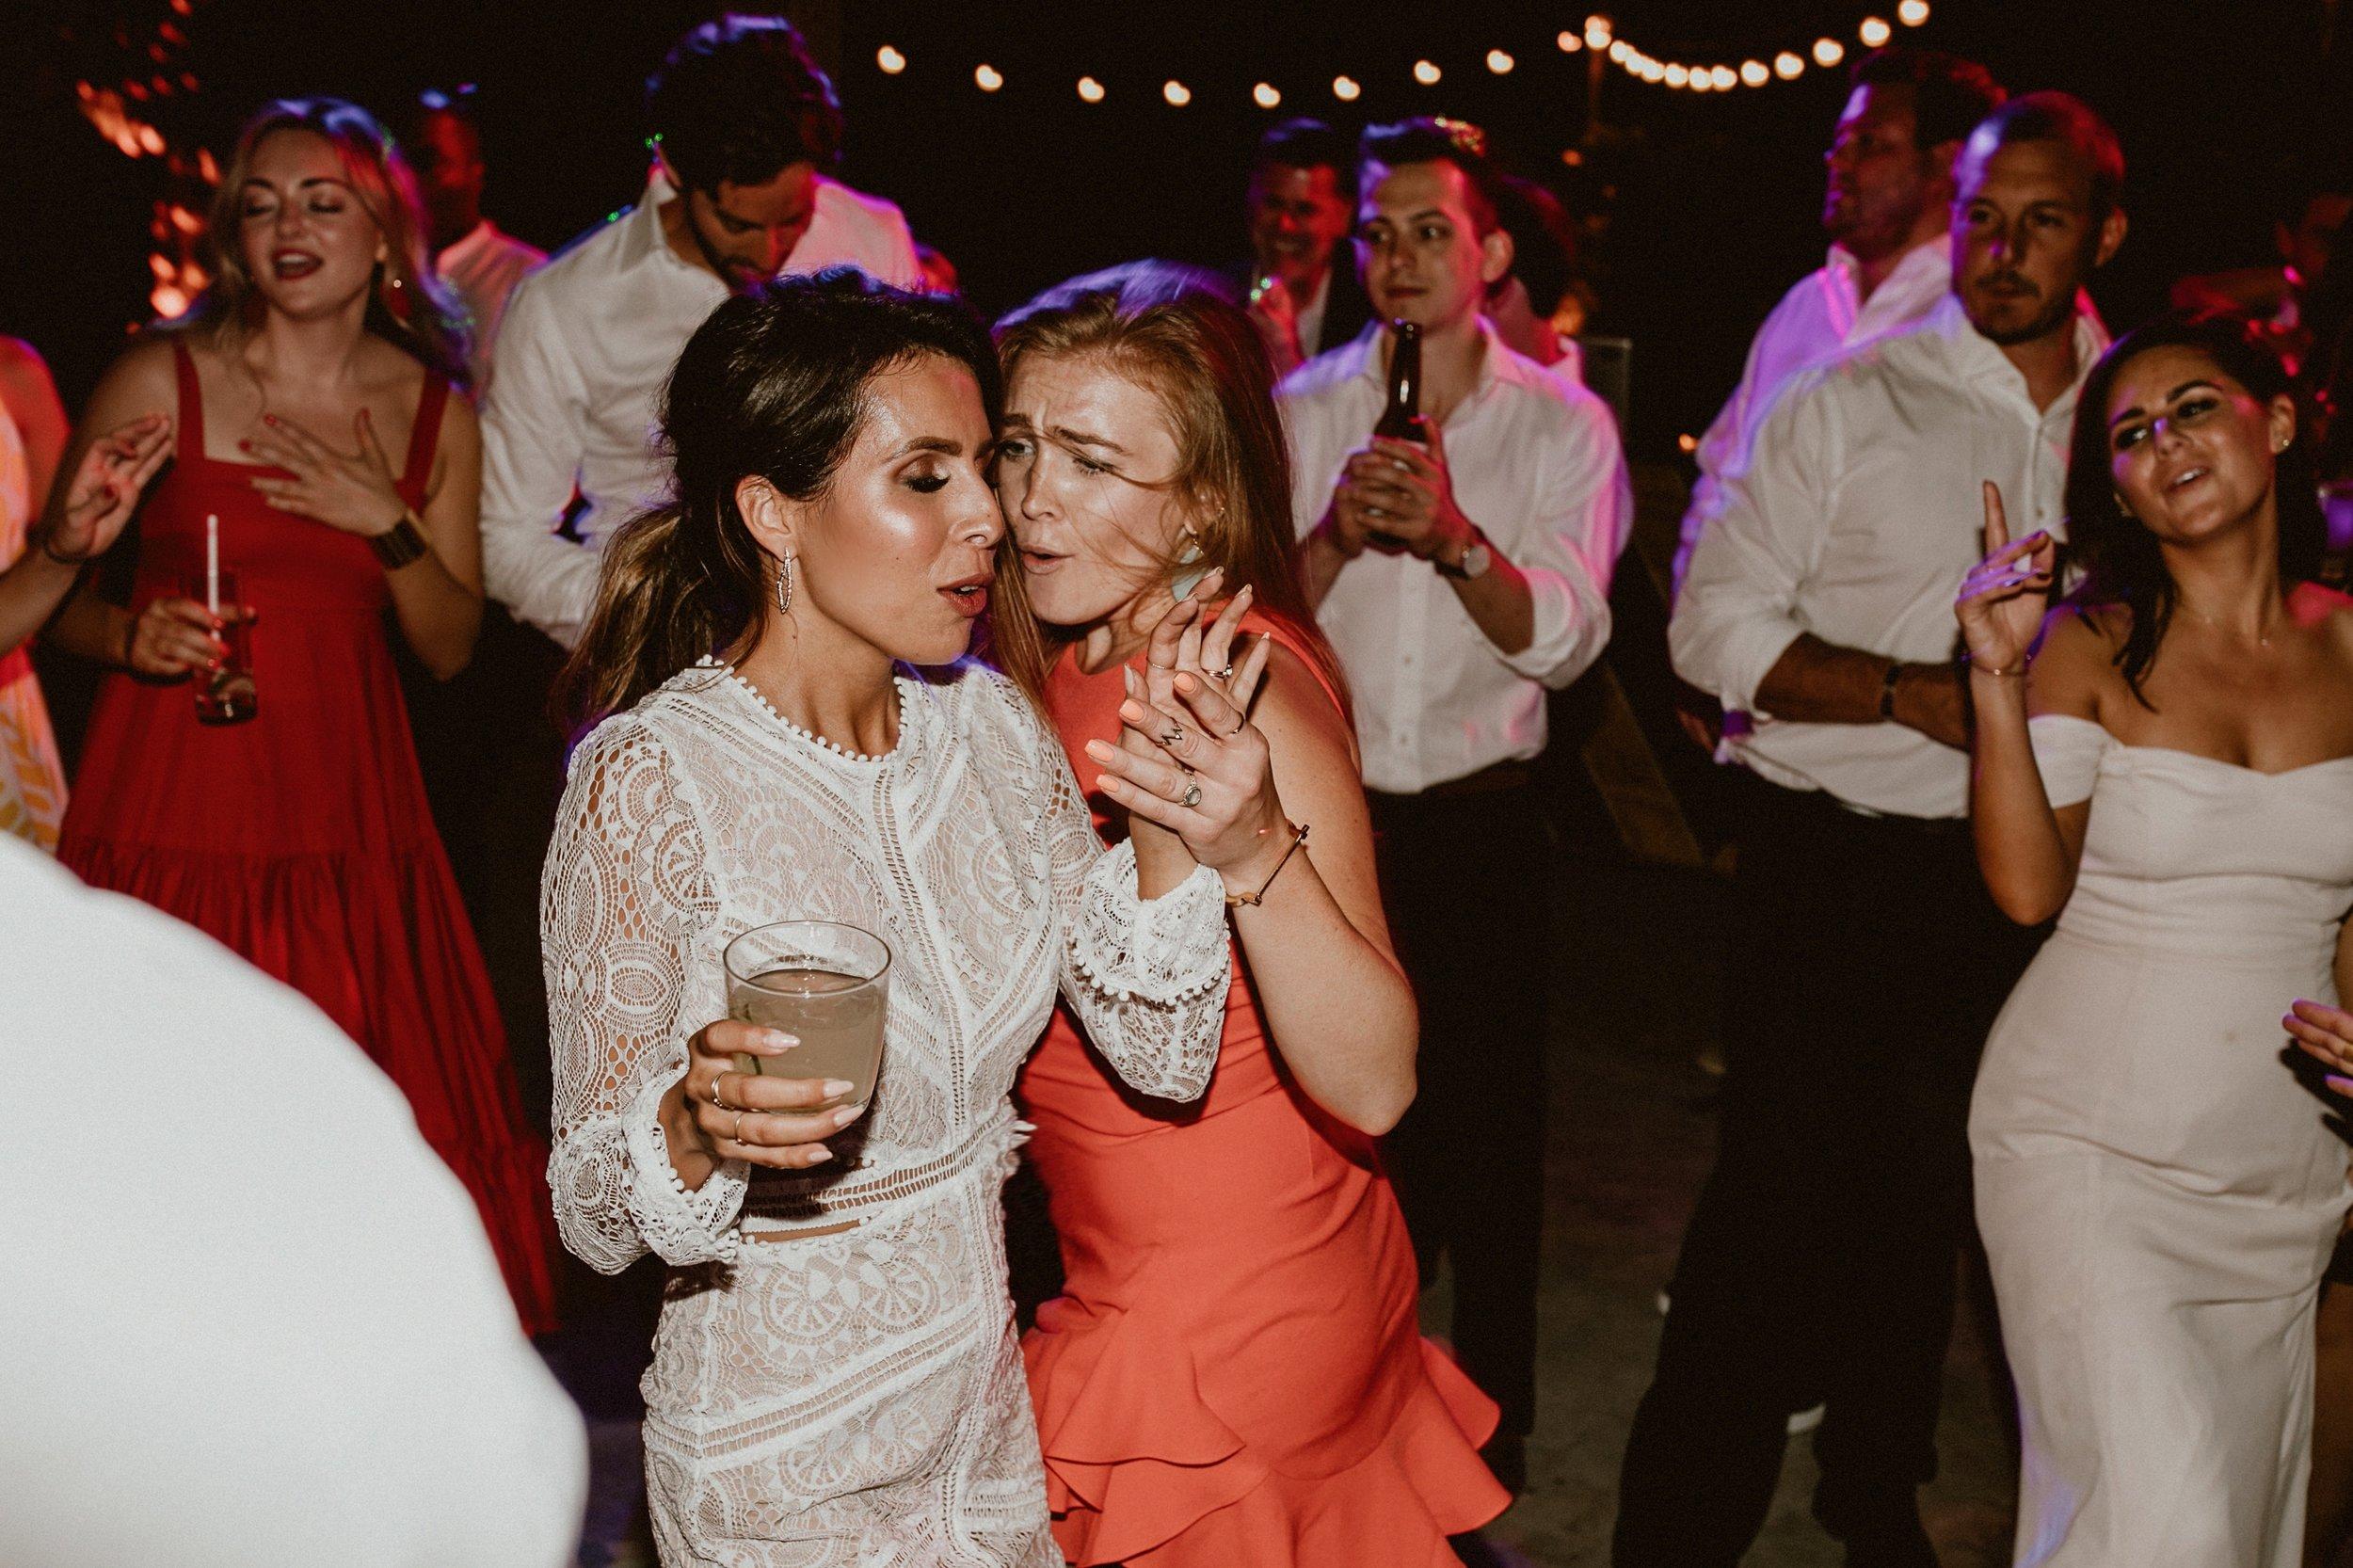 Marissa + Ashley at #a plusabigday